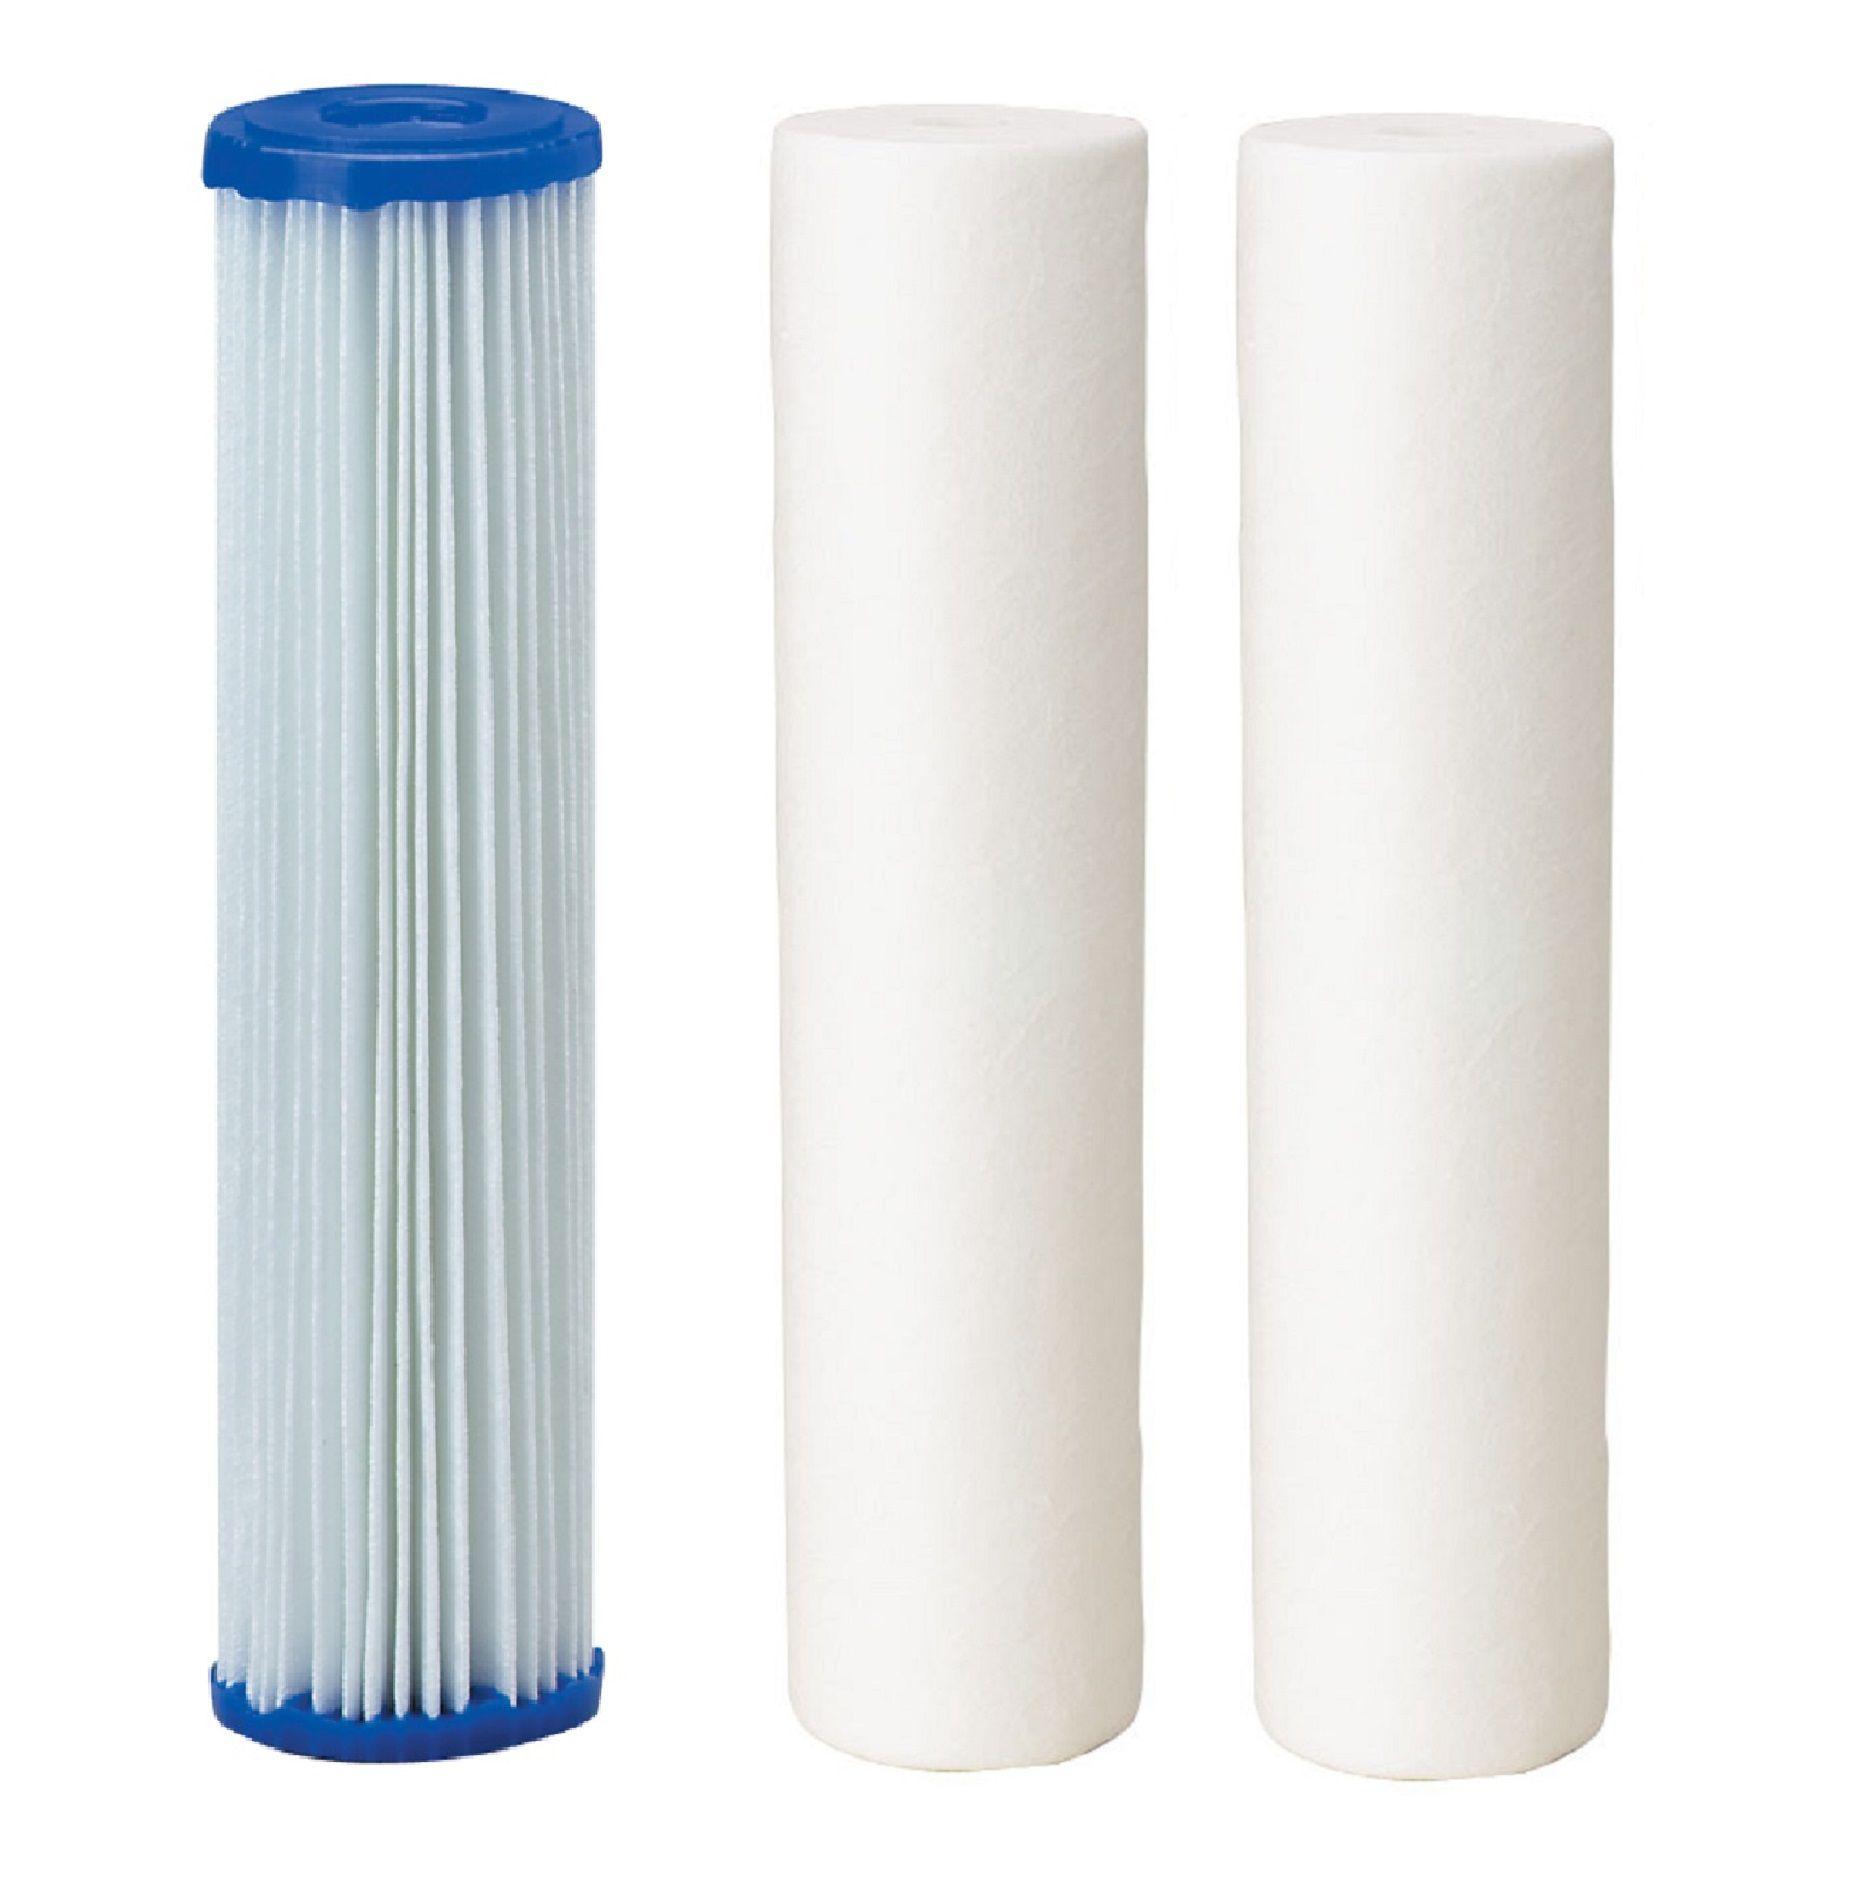 Kit Refis para Filtro Triplo de Entrada - 1 Elemento Filtrante Polipropileno Plissado 10 x 2.1/2 + 2 Elemento Filtrante Polipropileno Liso 10 x 2.1/2